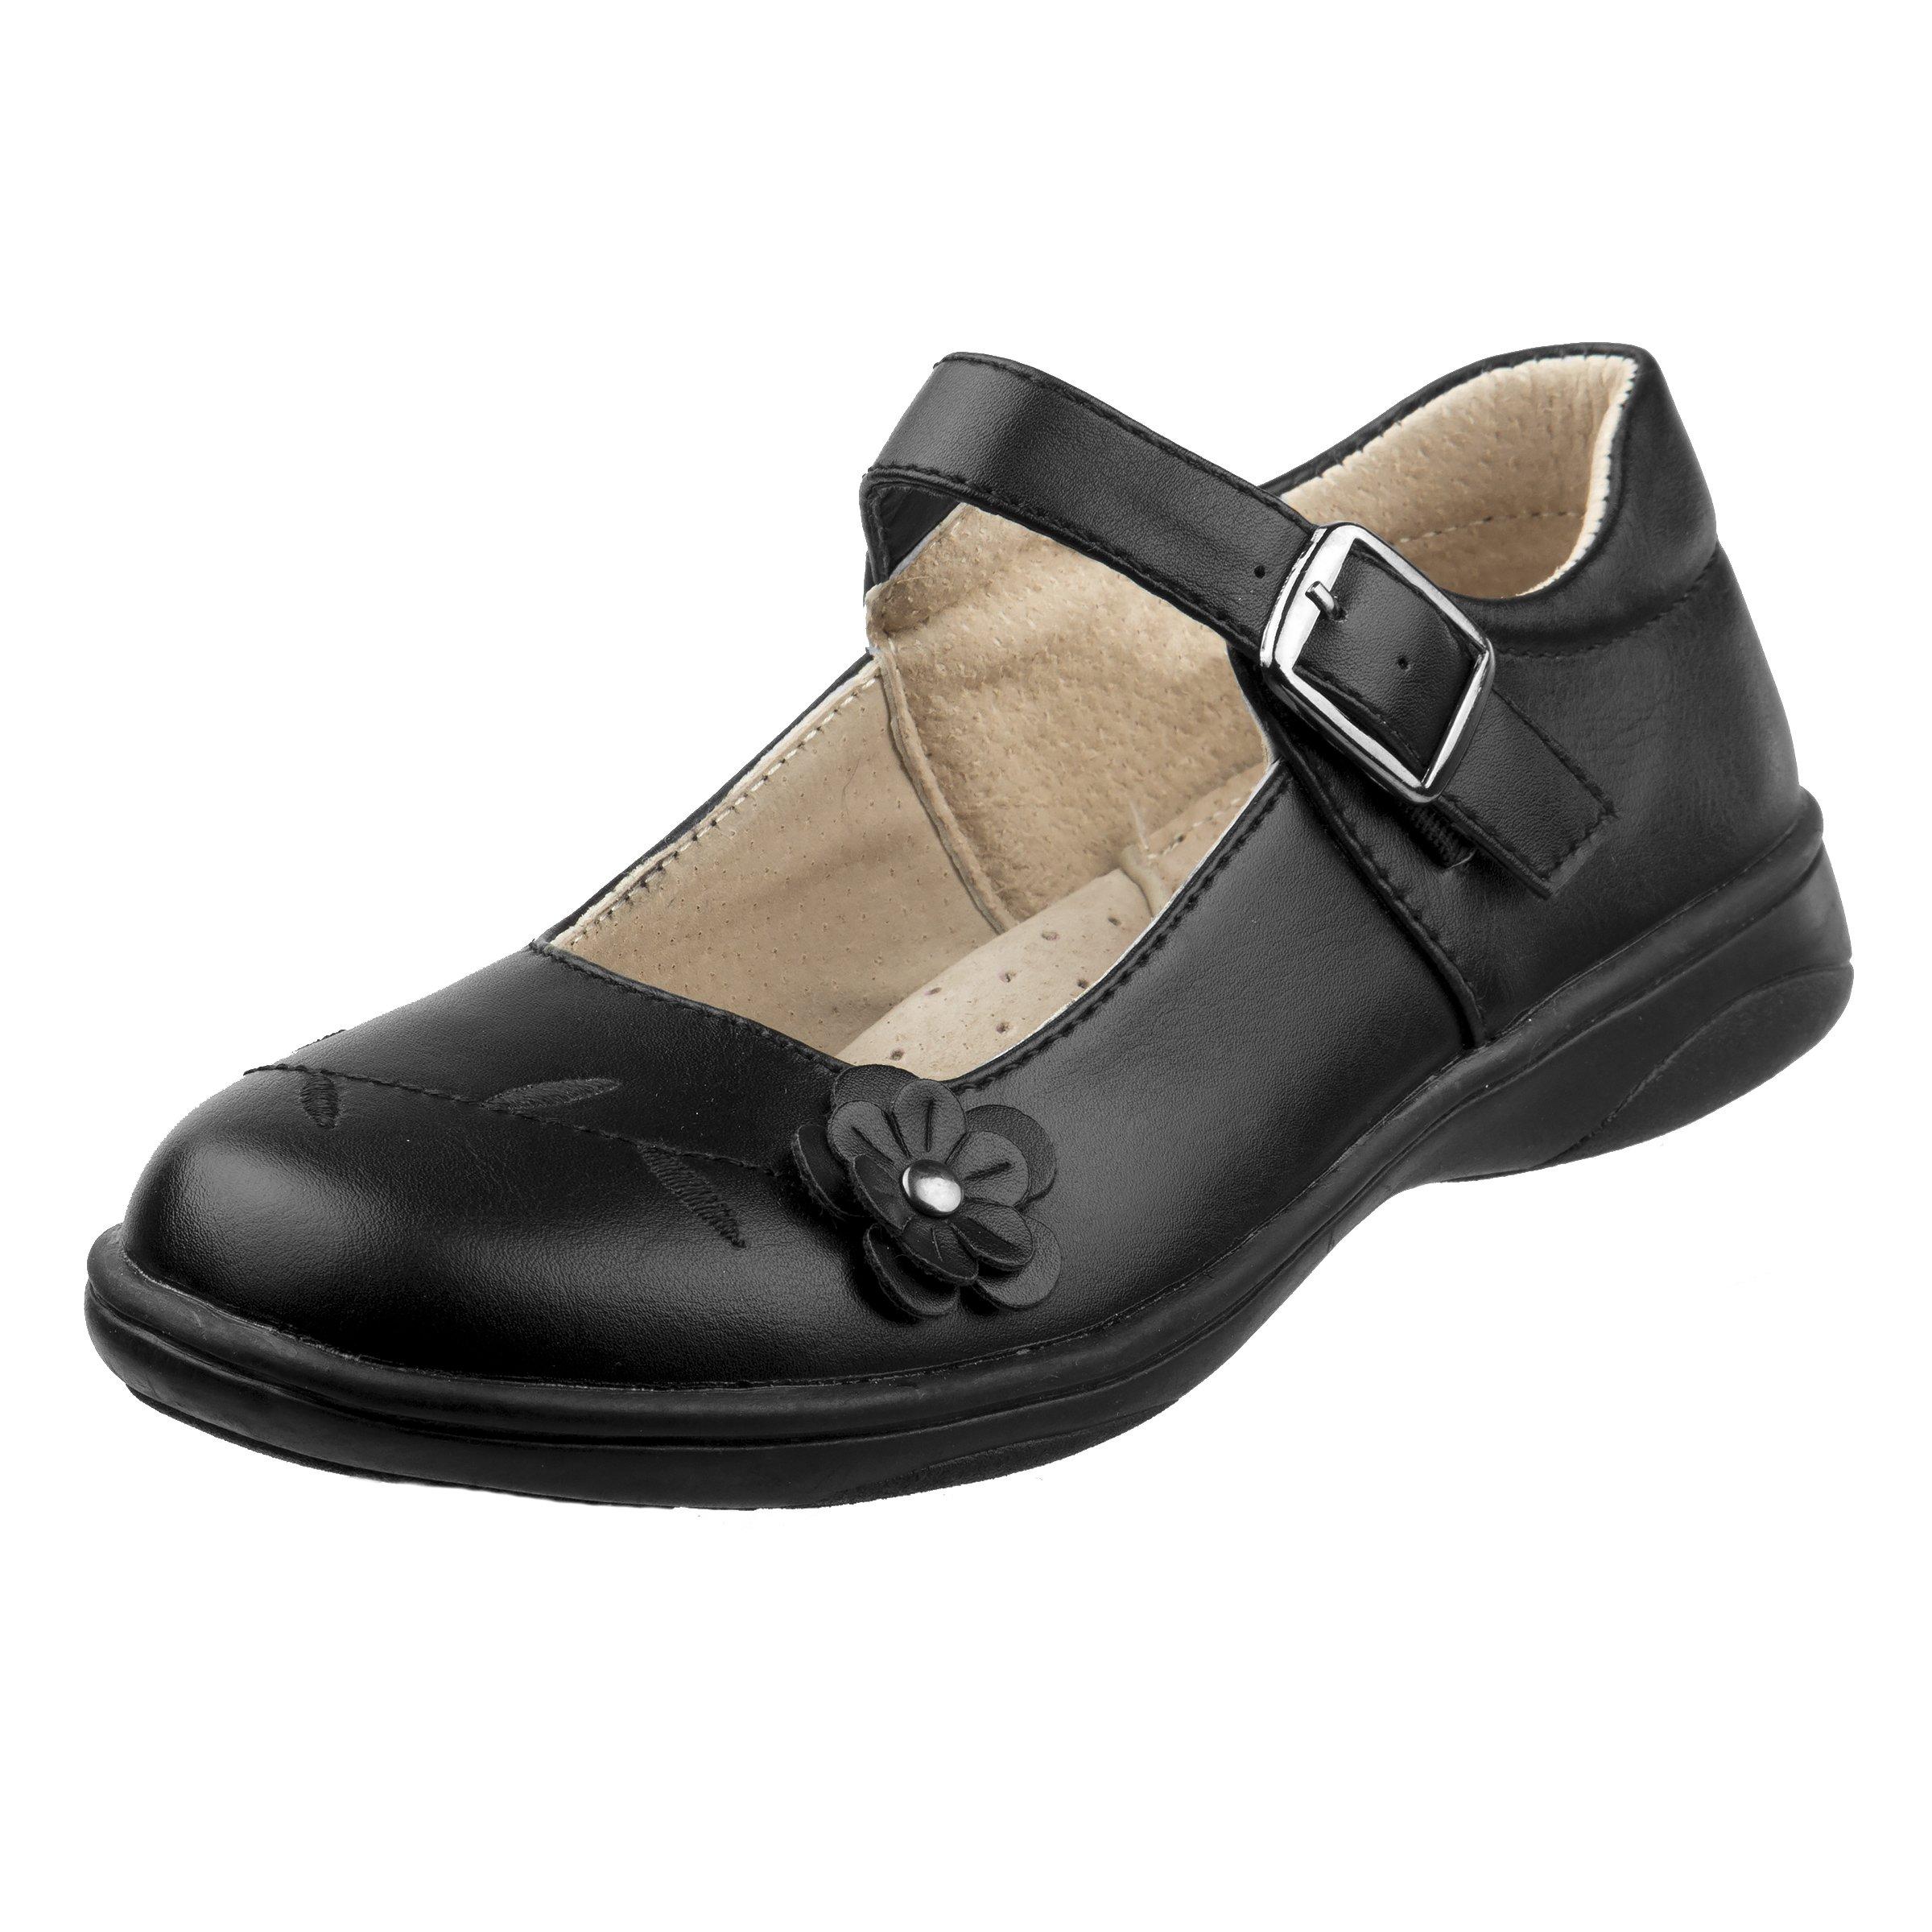 Laura Ashley Girls School Uniform Shoes with Elastic Gore Buckle, Black Flower, 2 M US Little Kid'